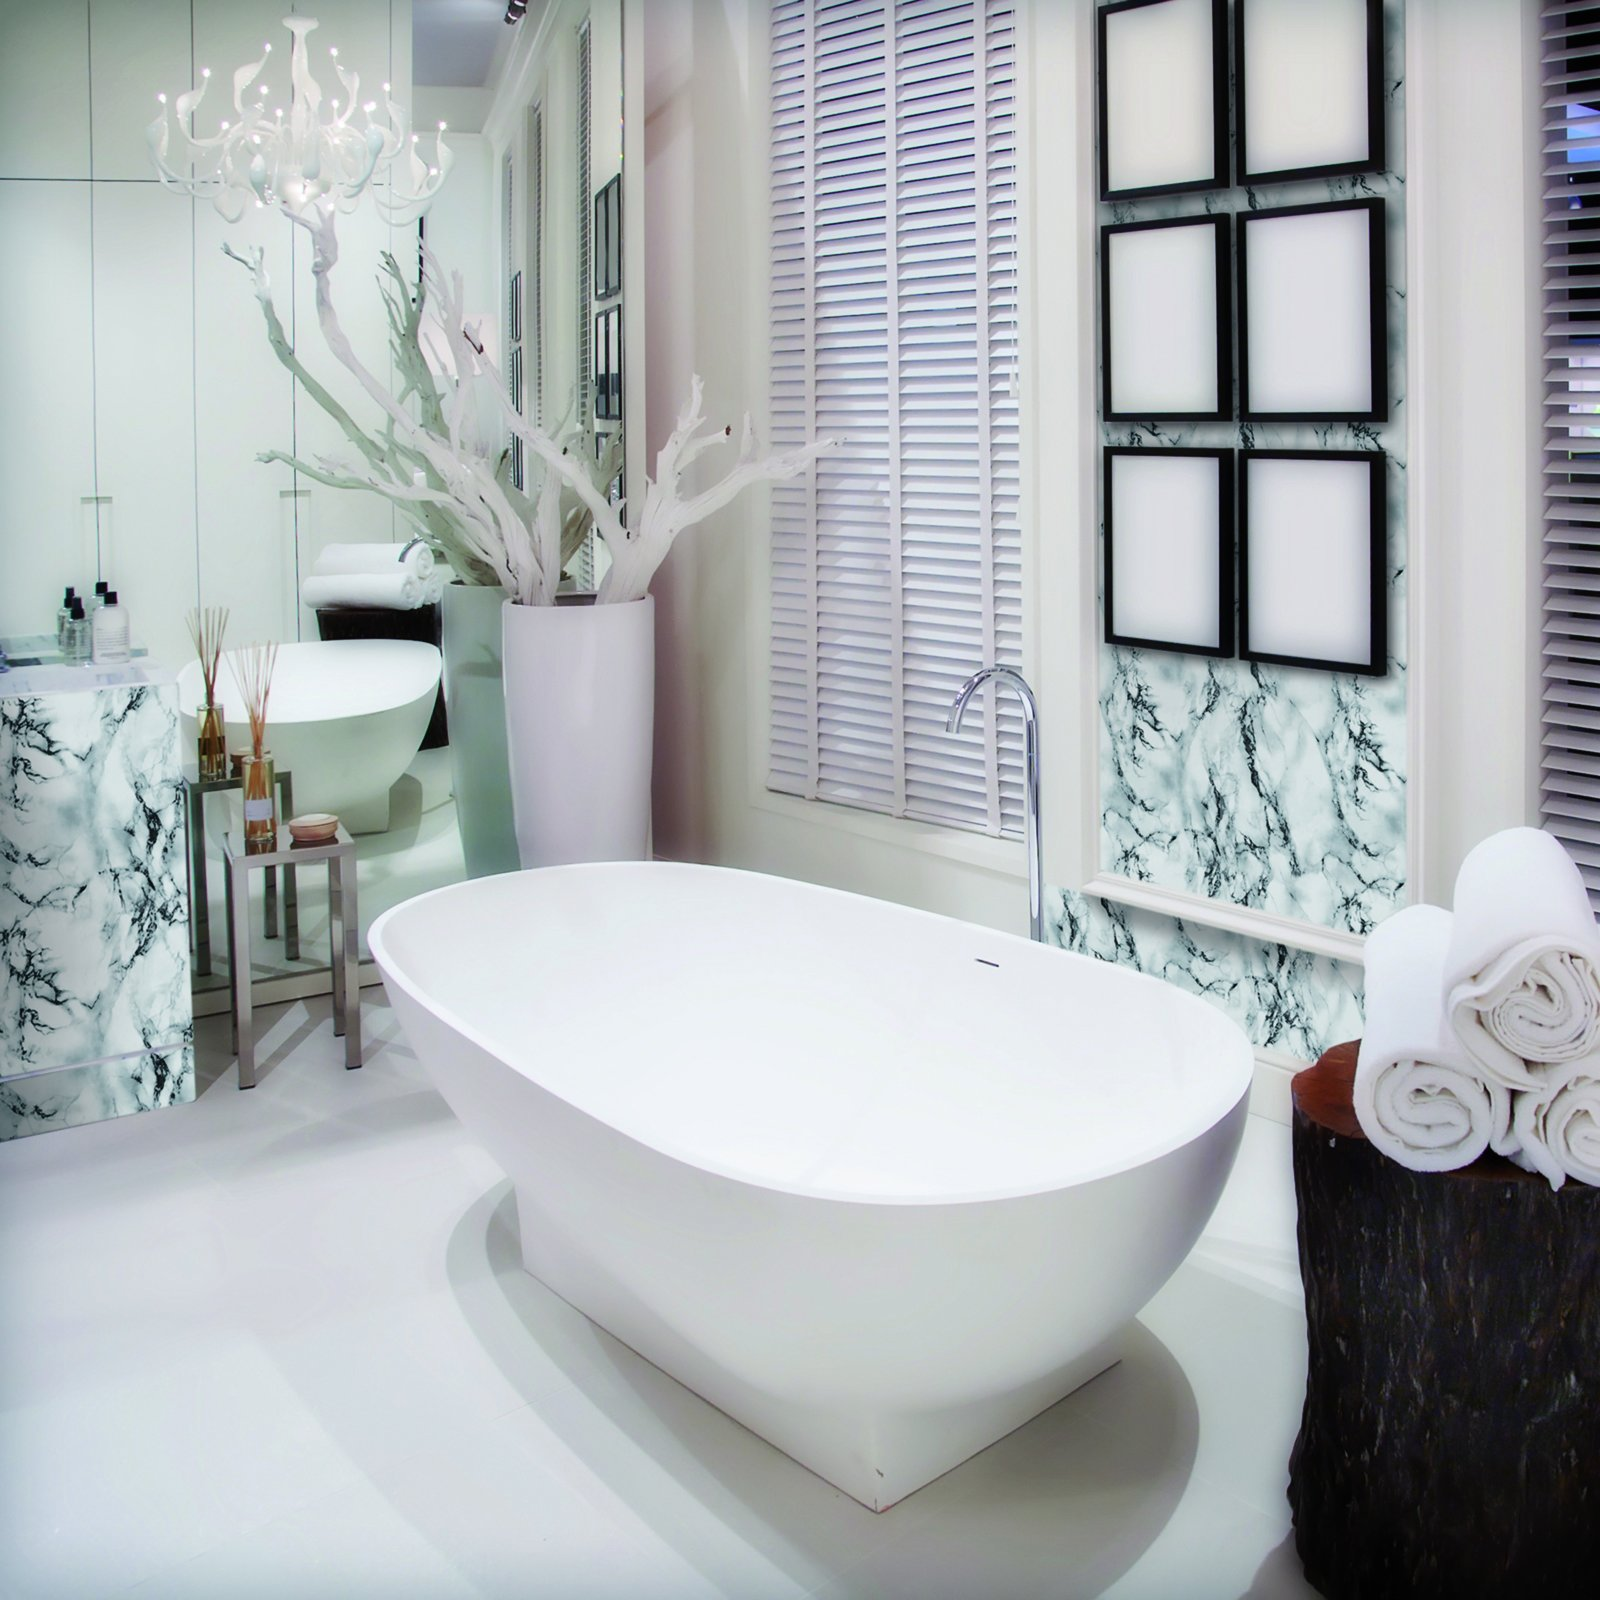 marmor klebefolie fabulous marmor klebefolie with marmor klebefolie latest klebefolie granit. Black Bedroom Furniture Sets. Home Design Ideas